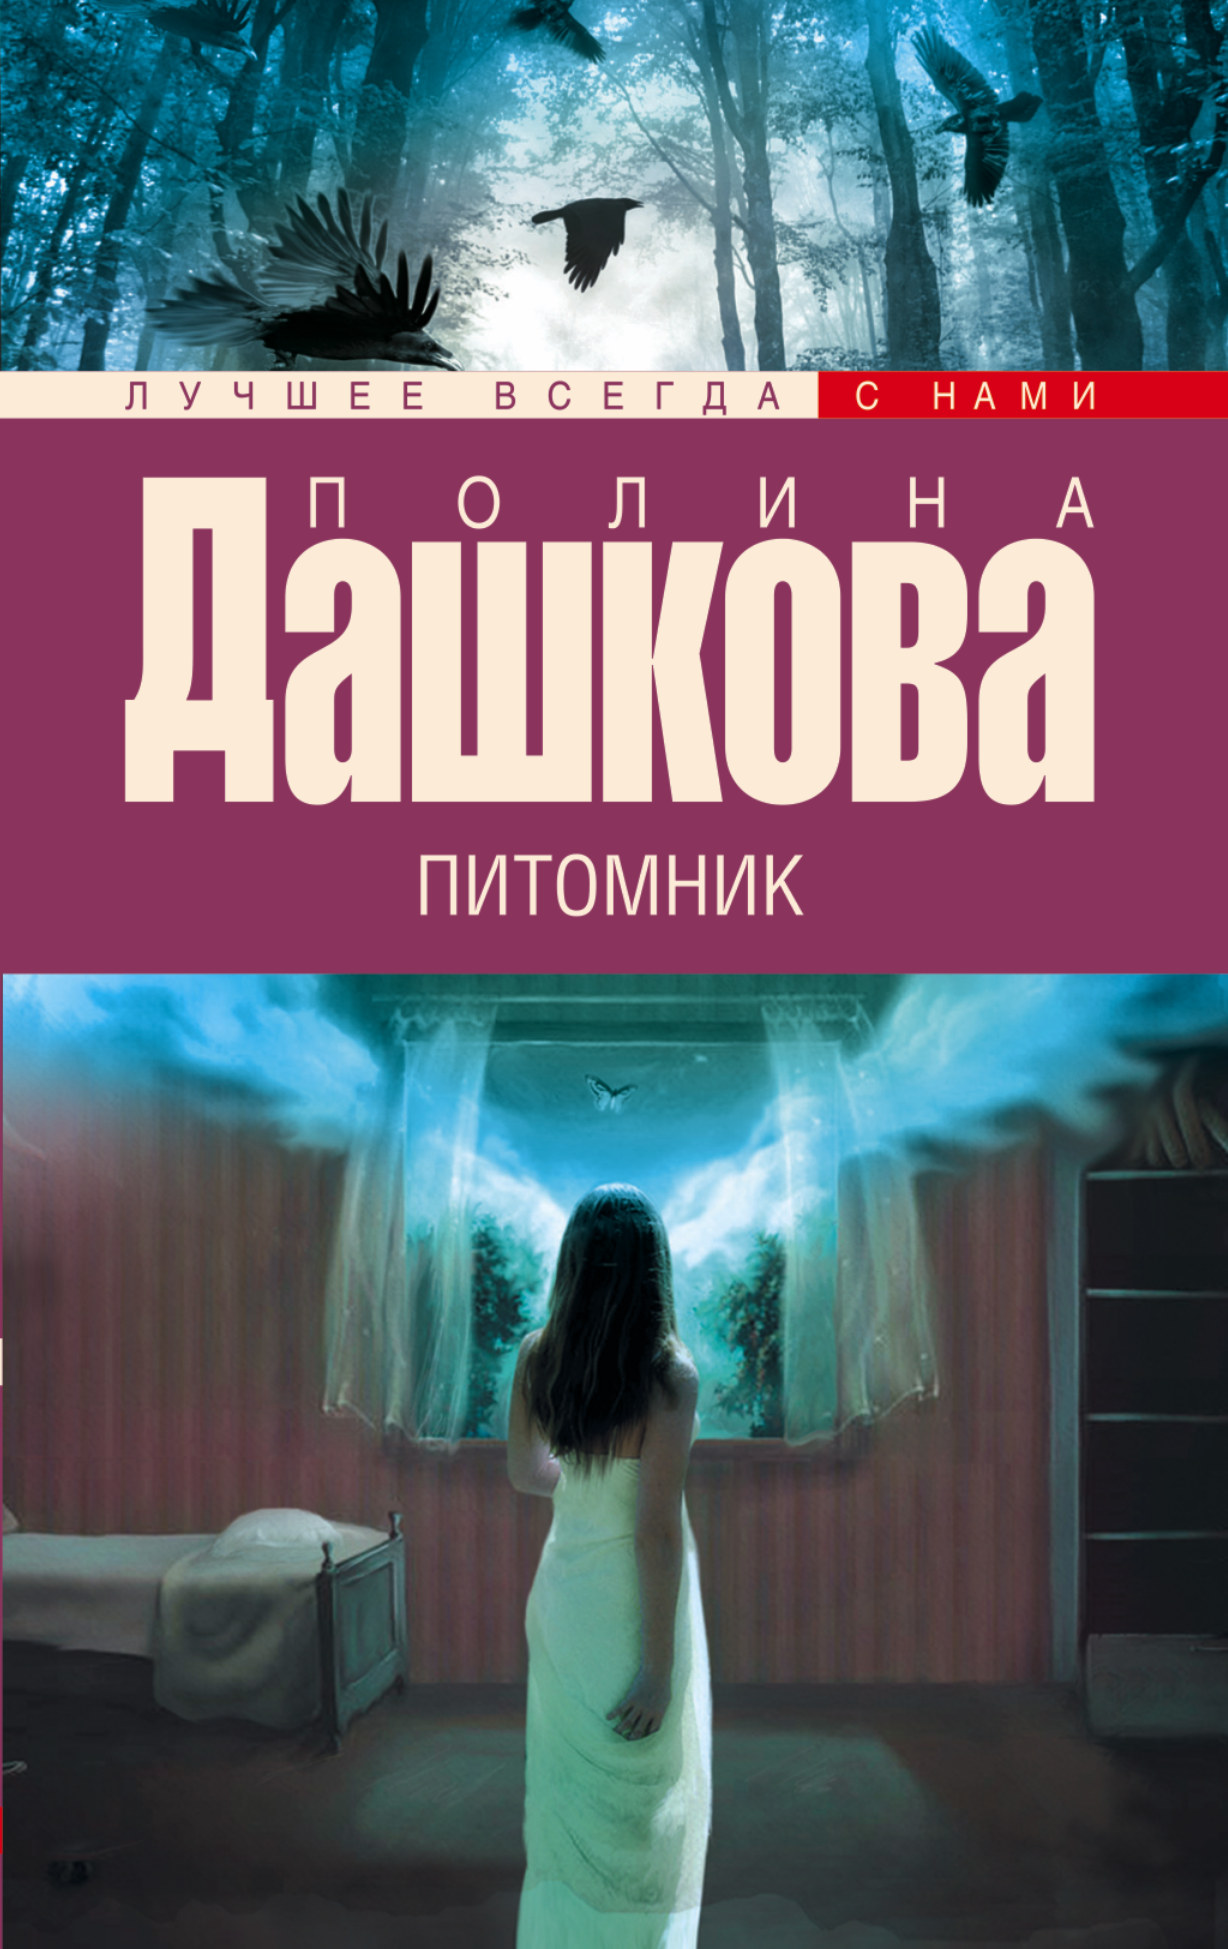 Дашкова П.В. Питомник